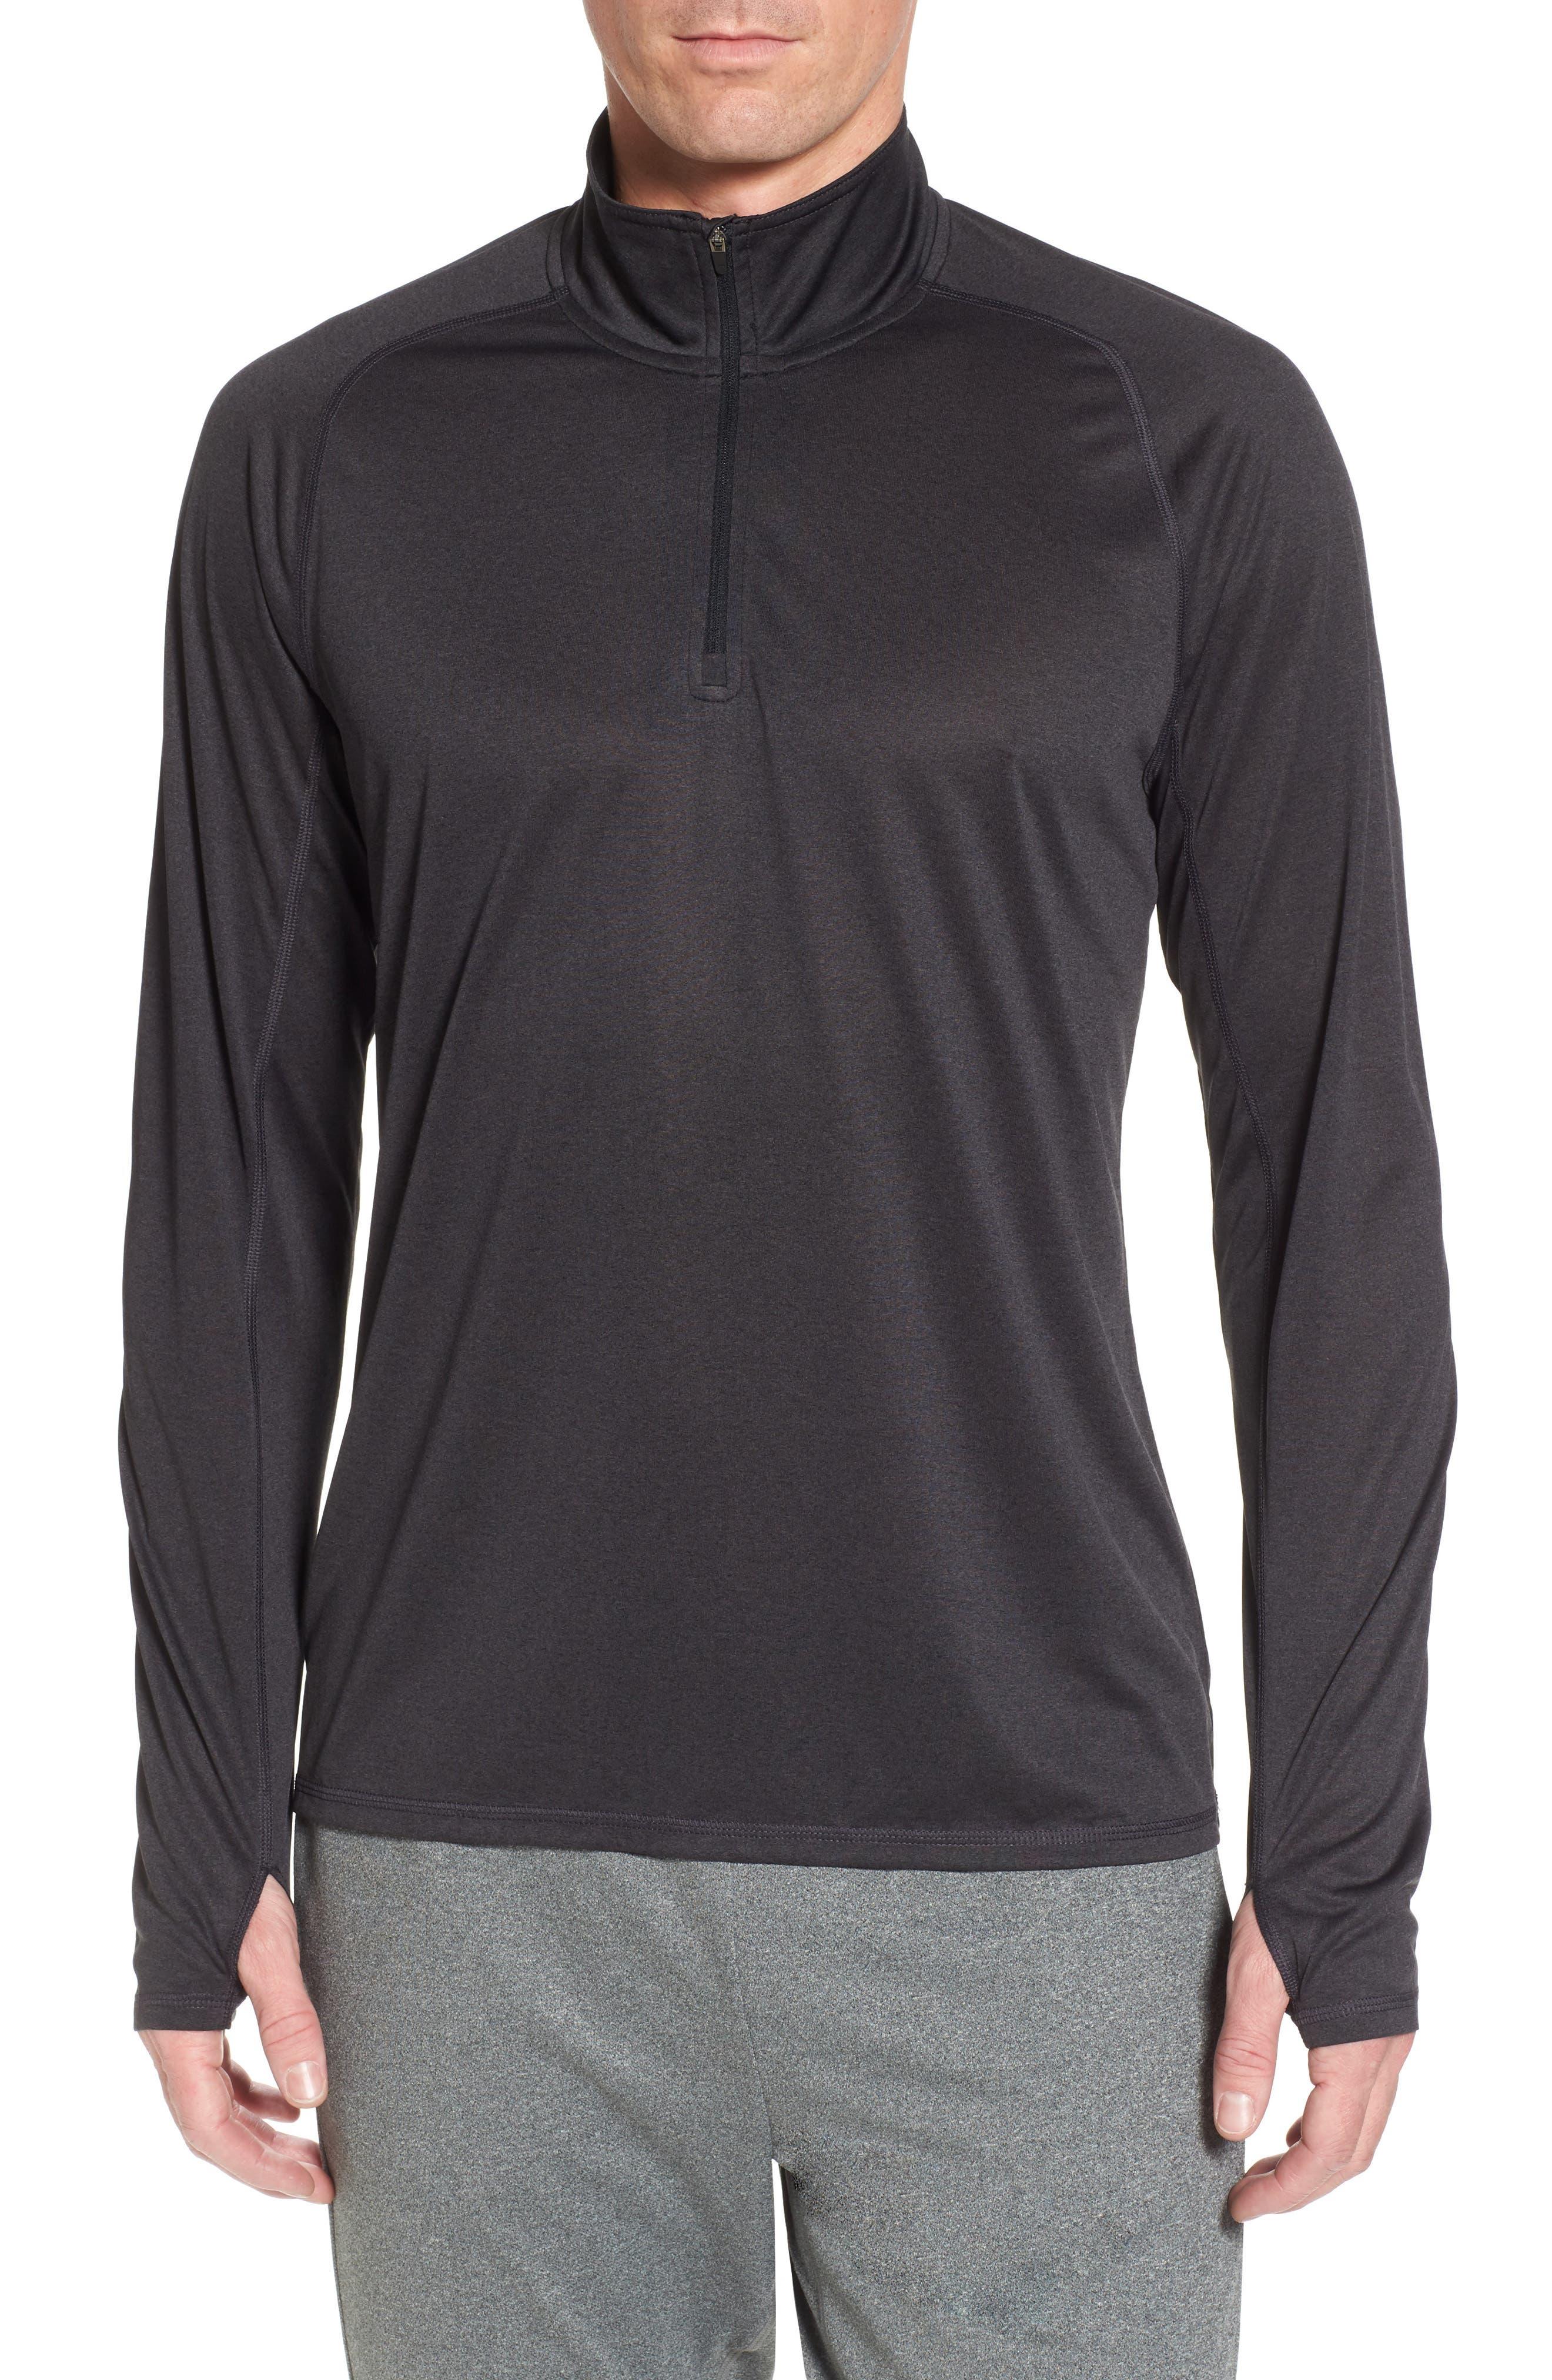 Jordanite Quarter Zip Pullover,                         Main,                         color, 001